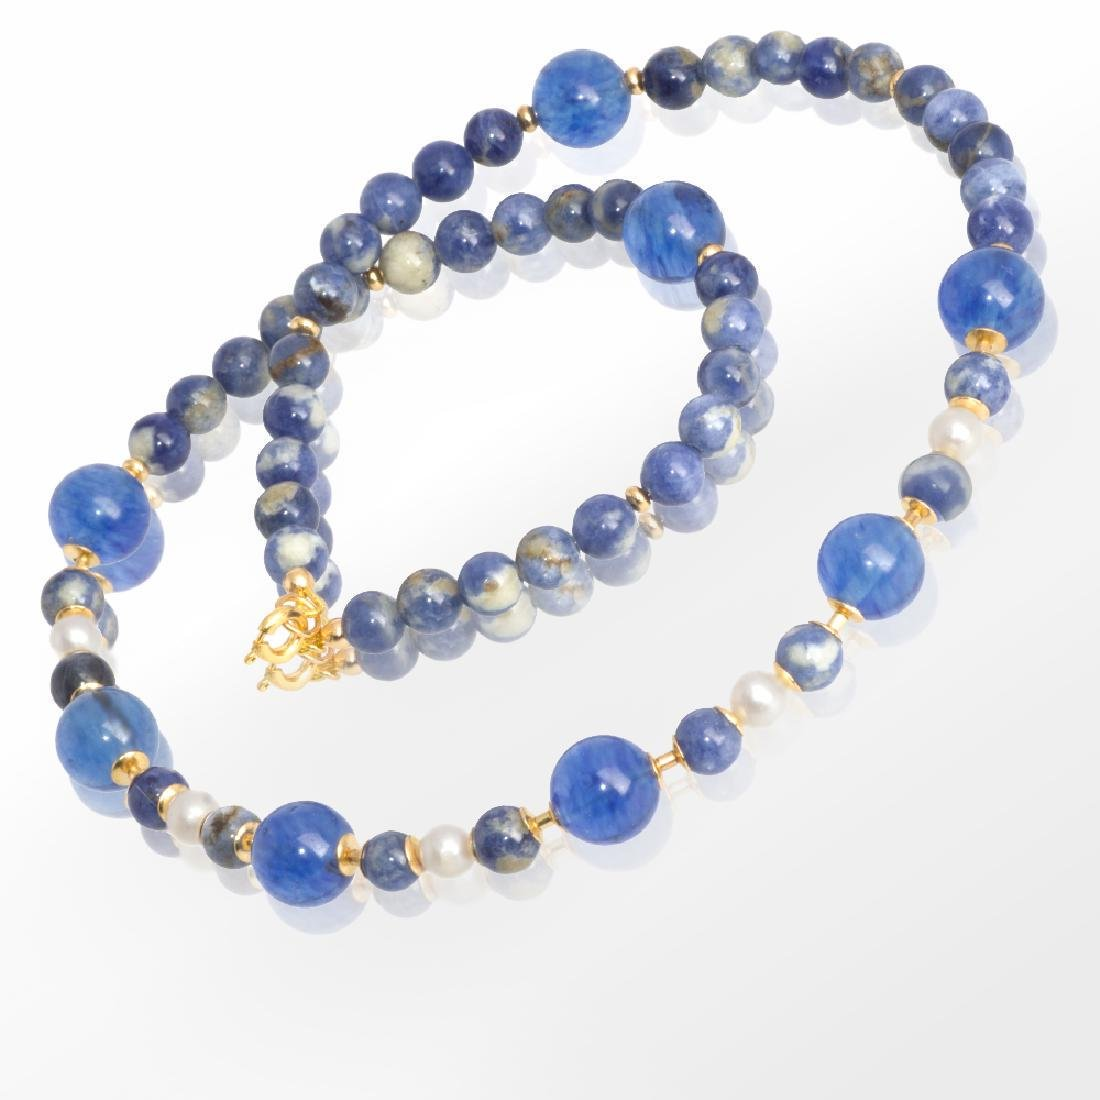 Sodalite and Capri quartz necklace with Pearls - 4